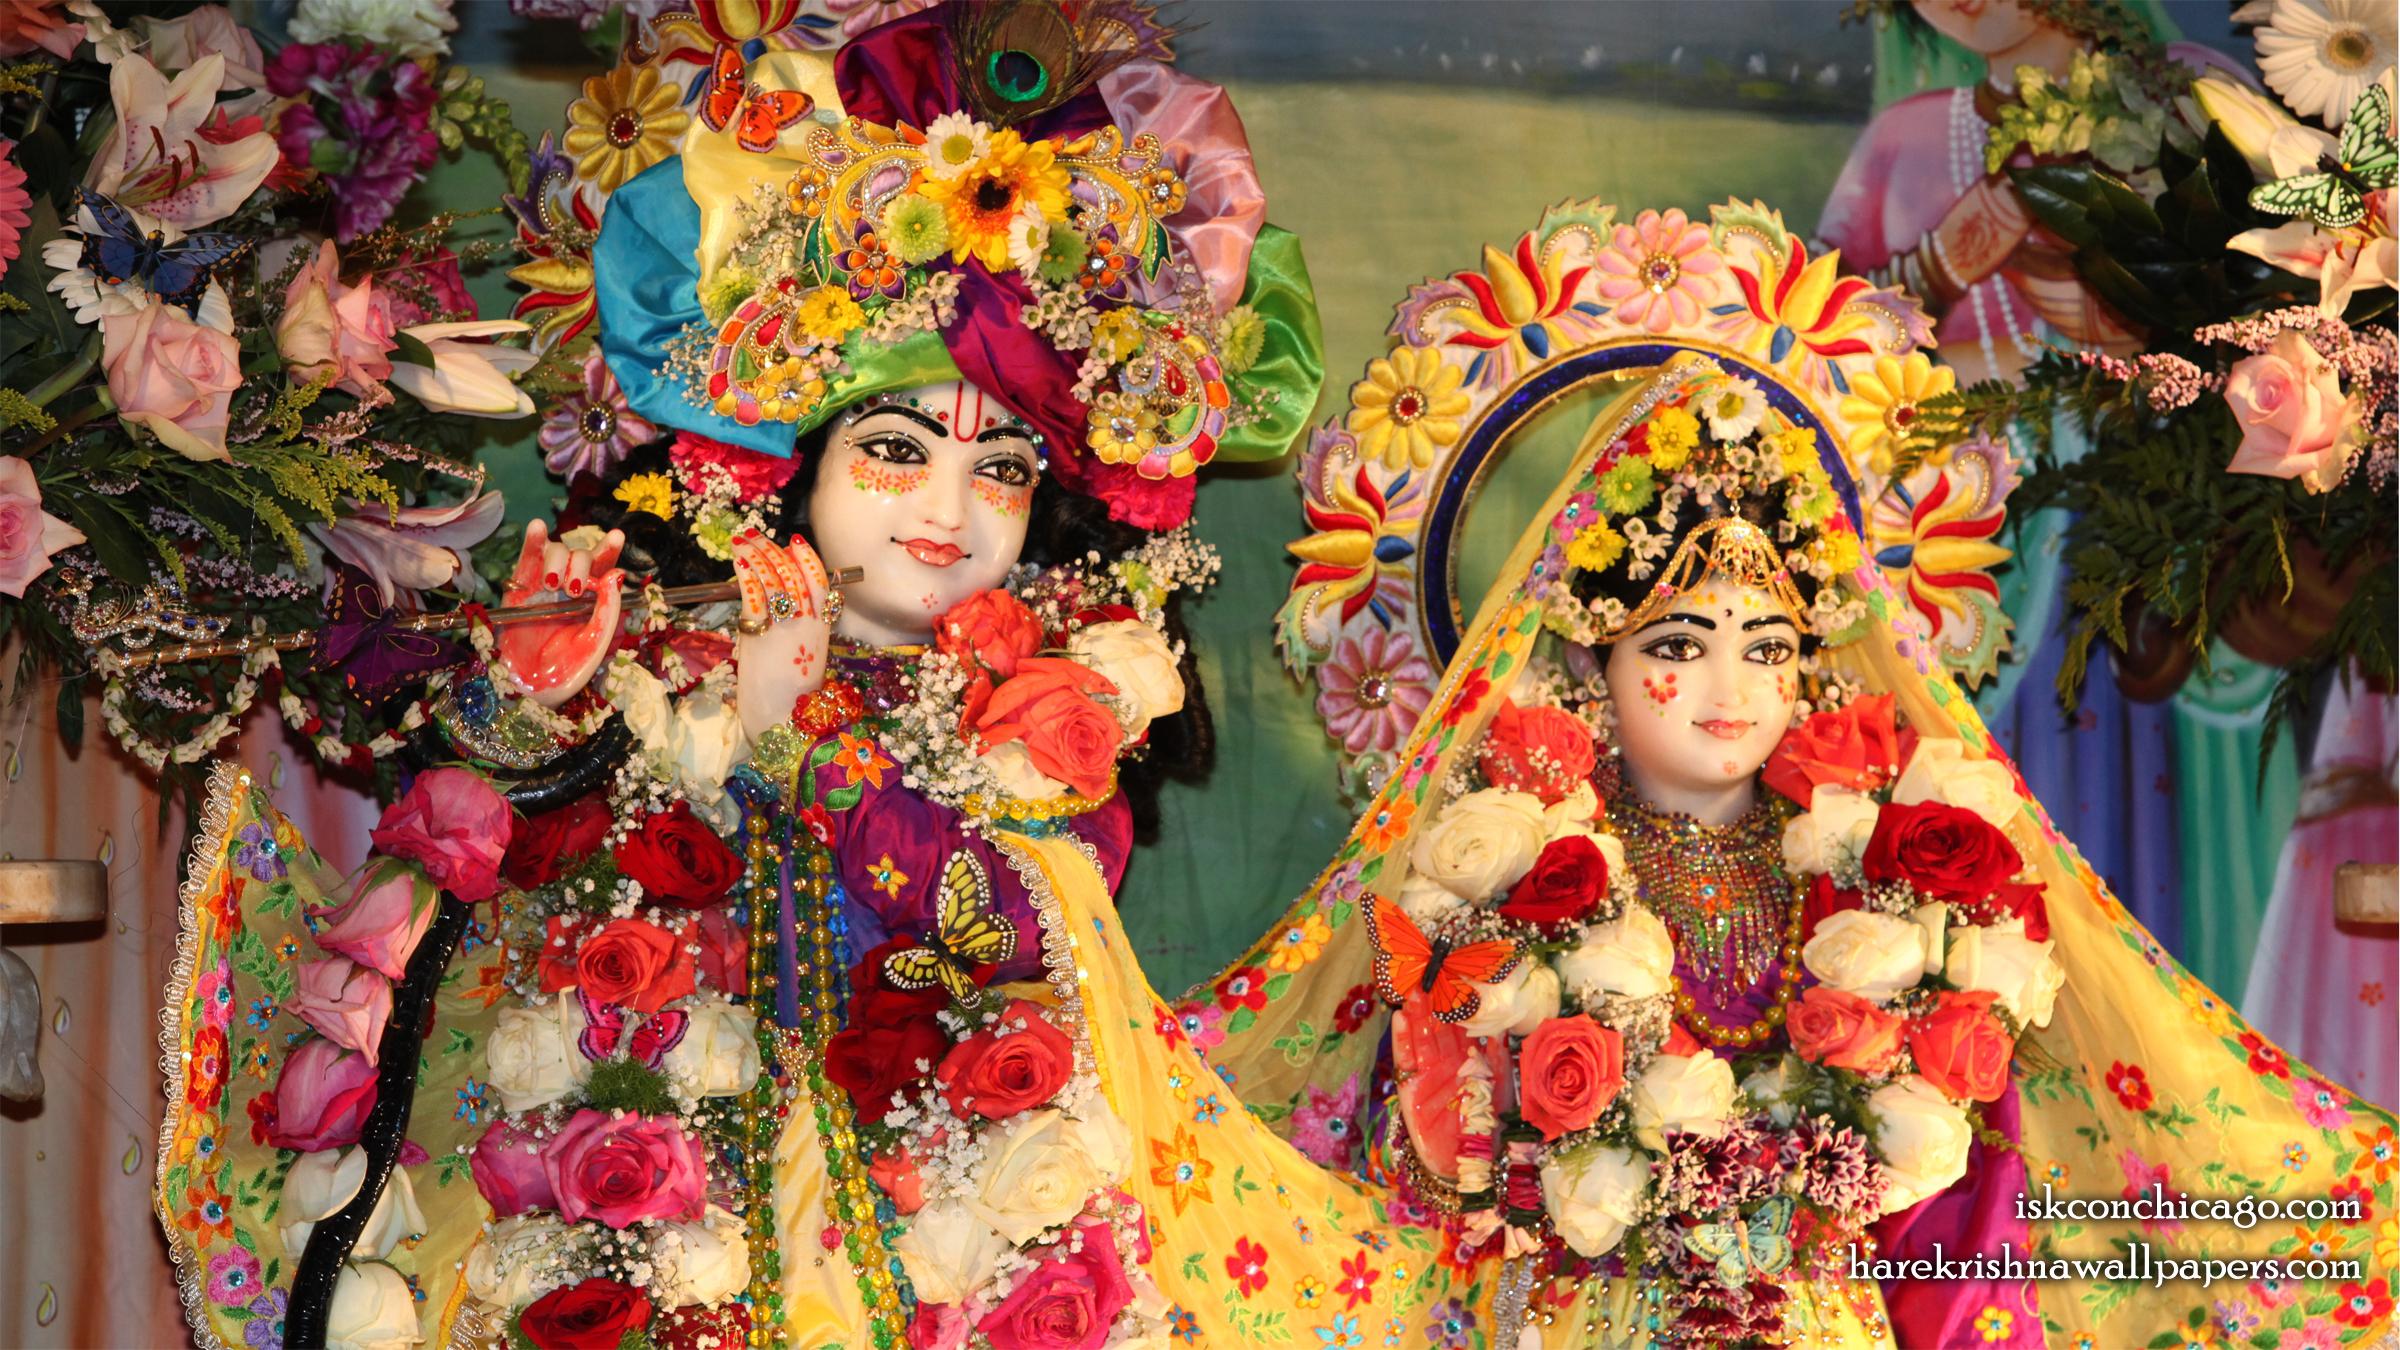 Sri Sri Kishore Kishori Close up Wallpaper (003) Size 2400x1350 Download